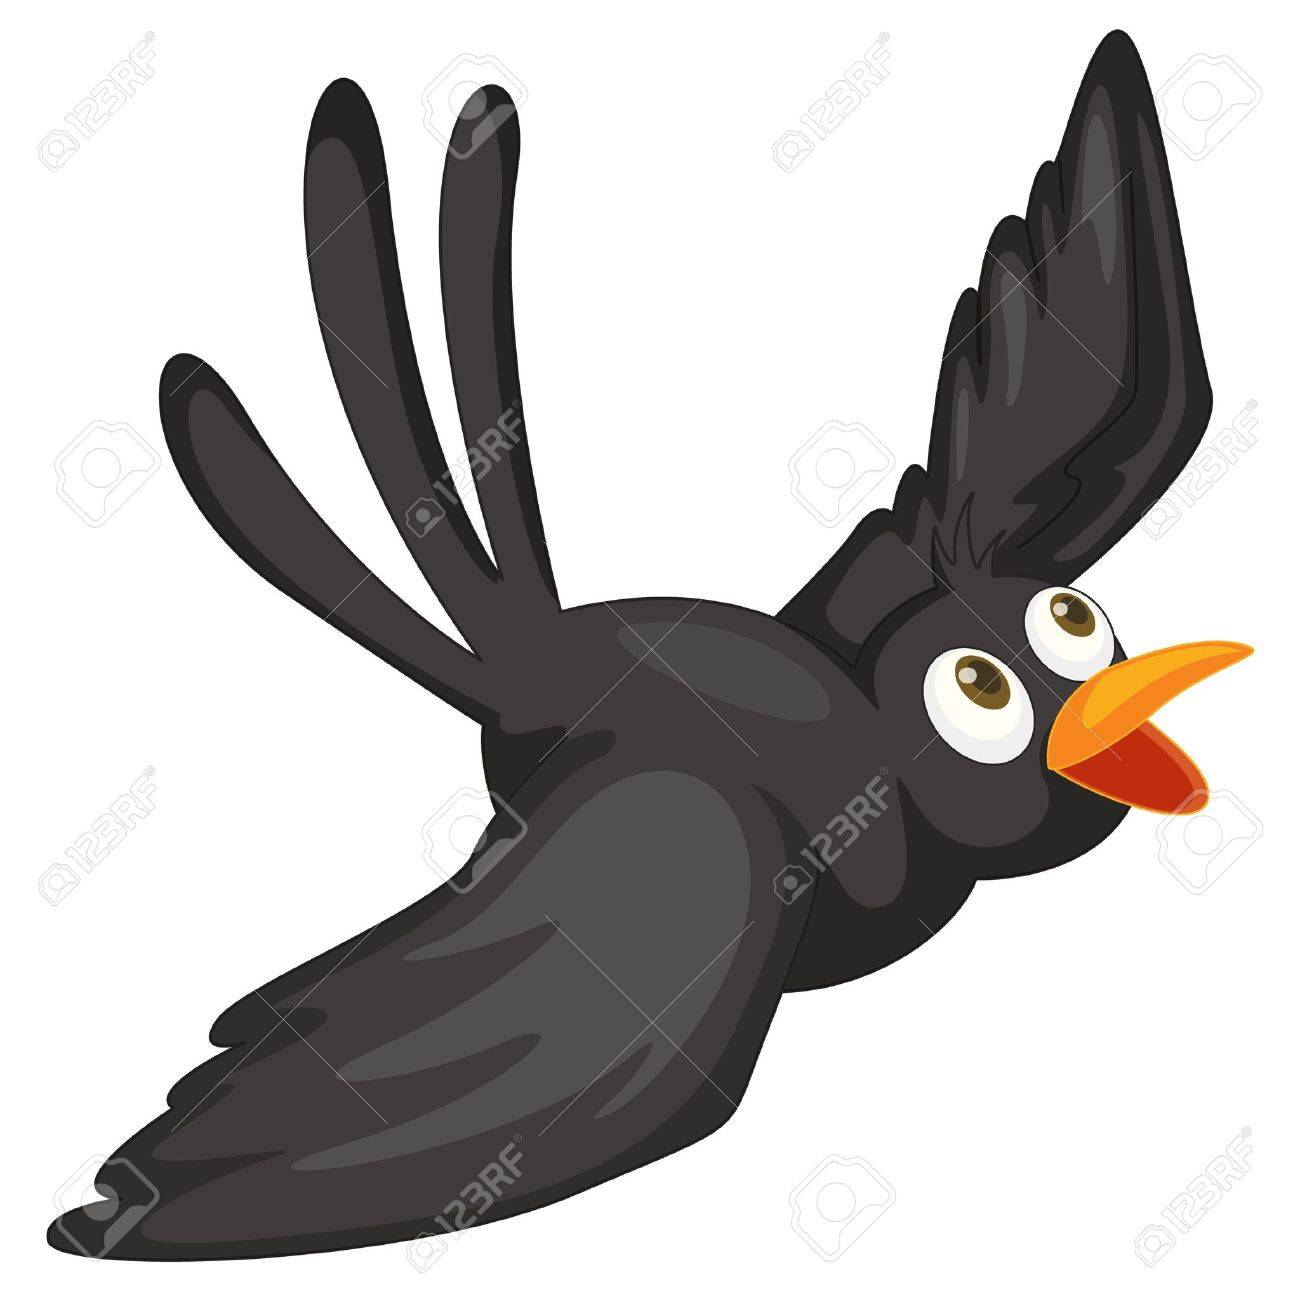 Illustration of a black bird on white Stock Vector - 13800482